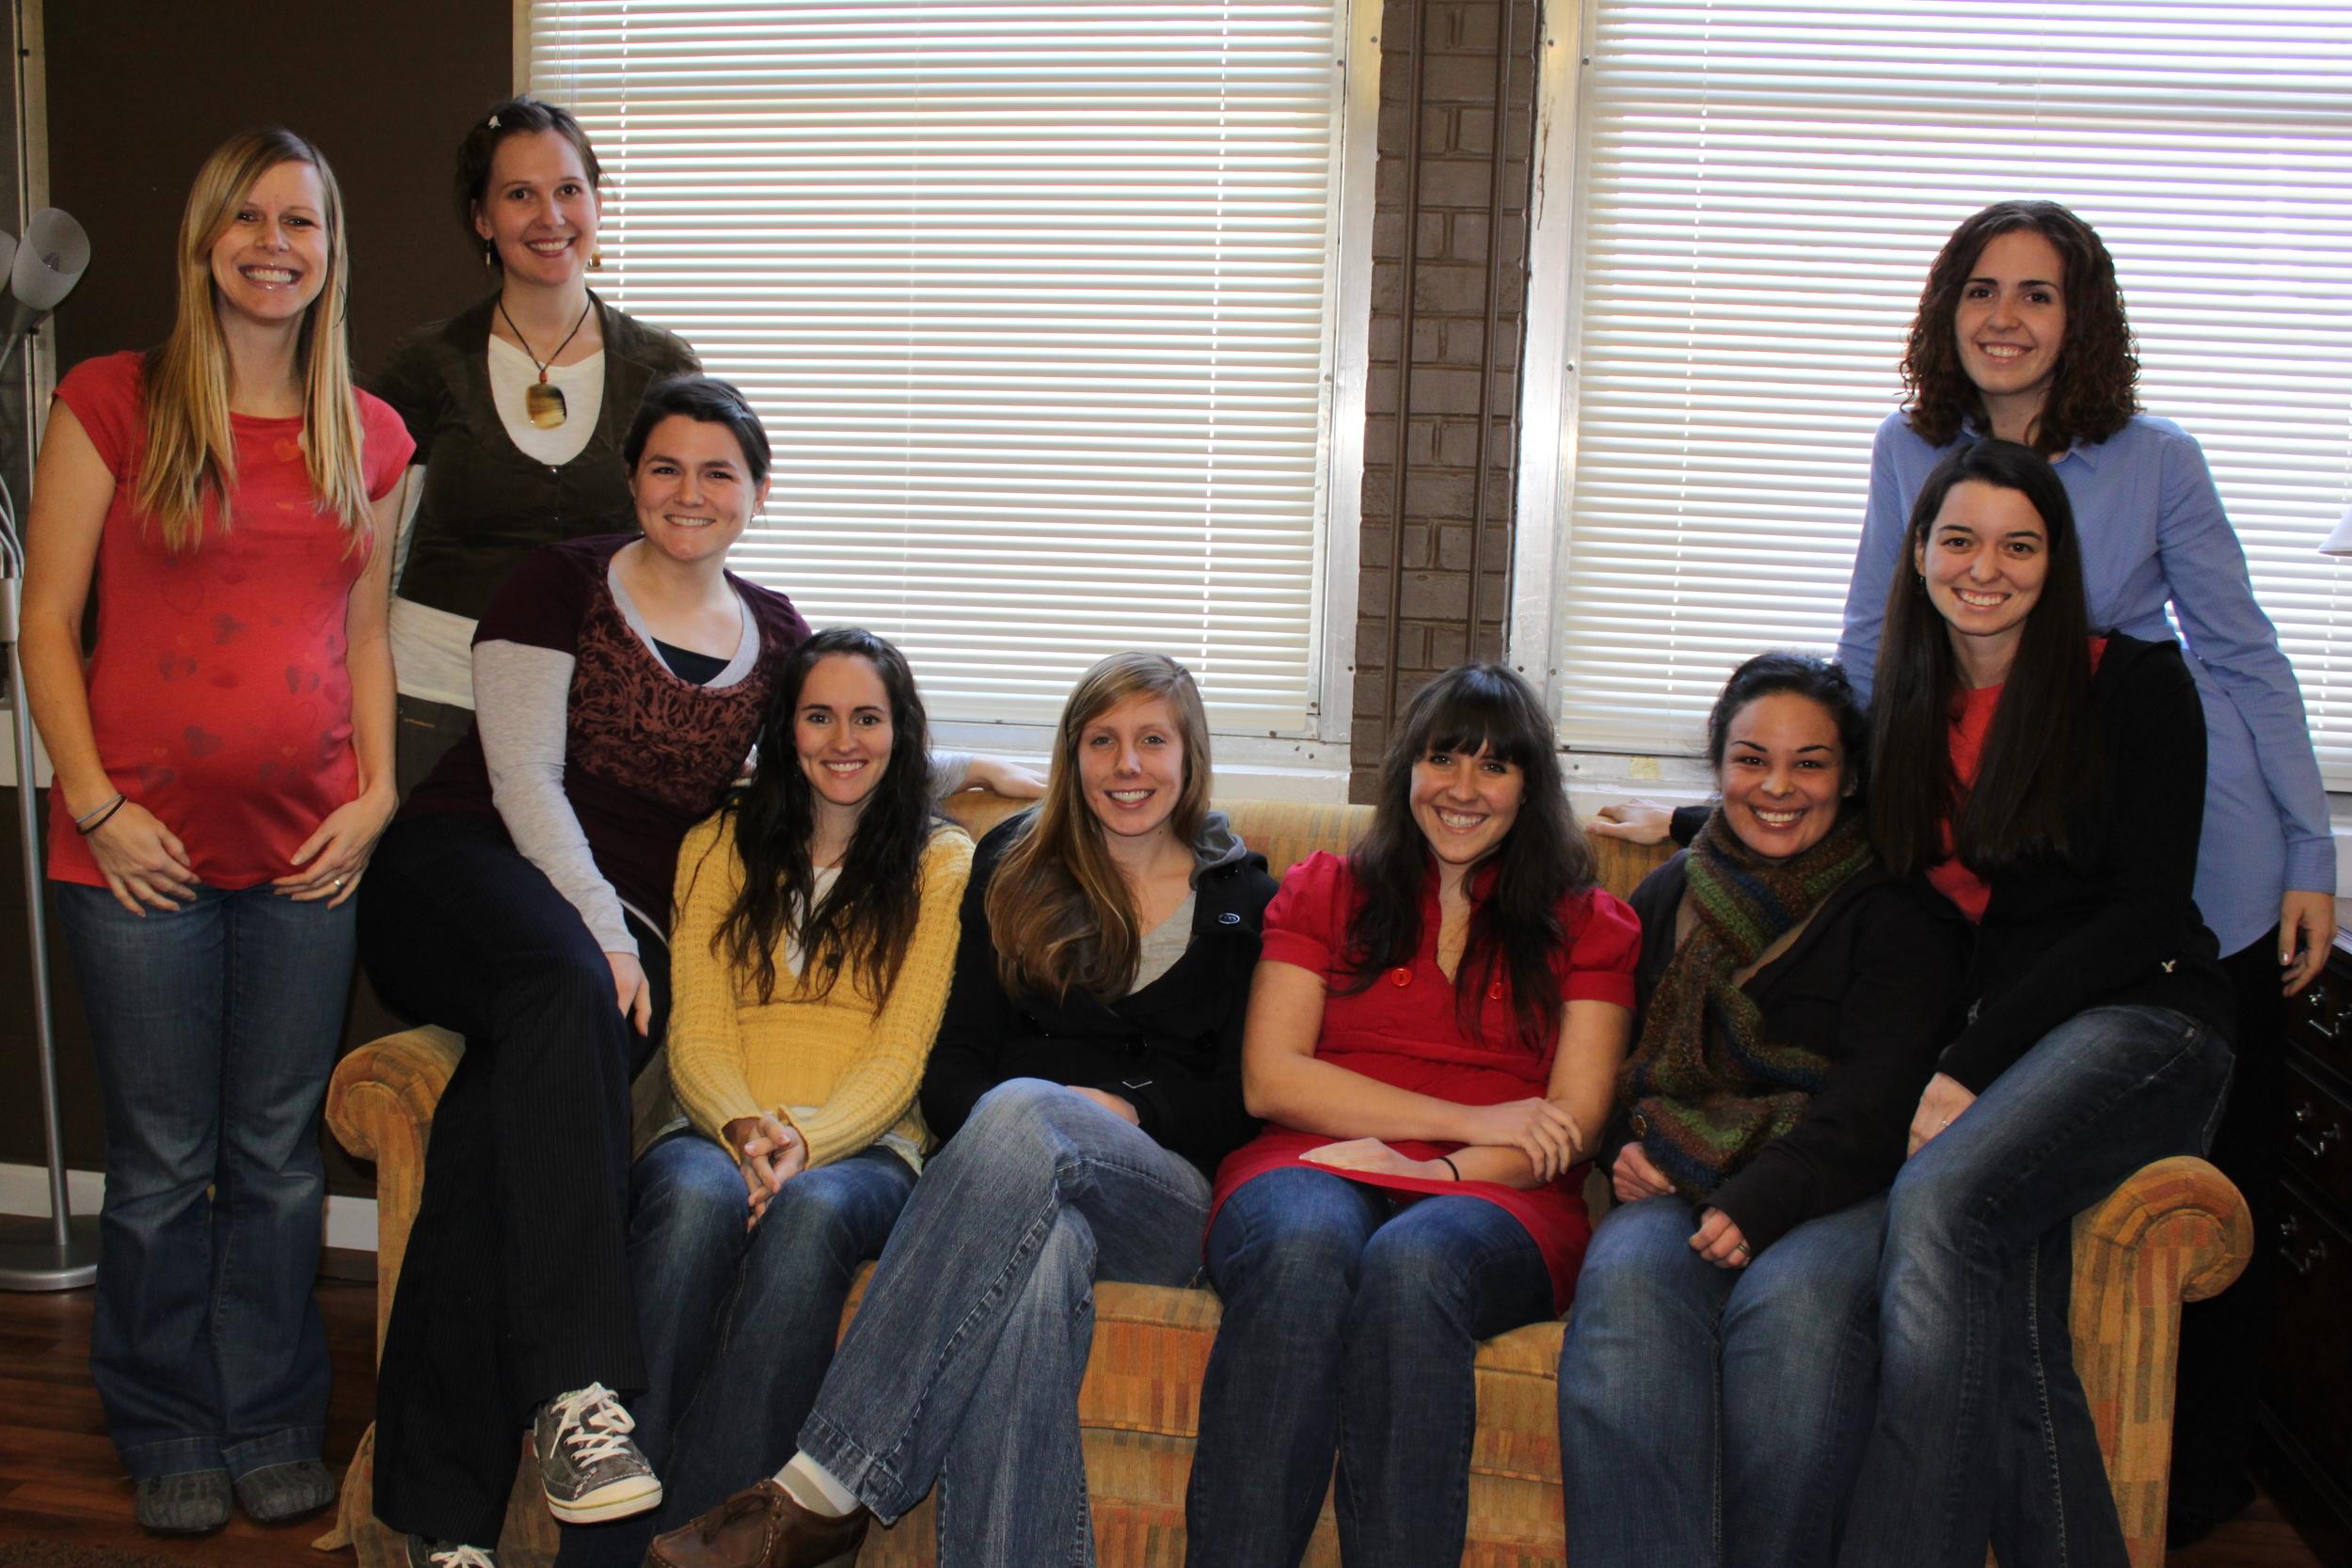 Pictured here are the inaugural instructors and students of the NOVA Childbirth Education program. From left to right: Tara Garner, Kristina Davis, Elise Buckner, Tori Roufs, Meg Mathews, Megan Fleeman, Deborah Nava, Jodi Cowan, and Celesta Bargatze (Michelle Madron not pictured).